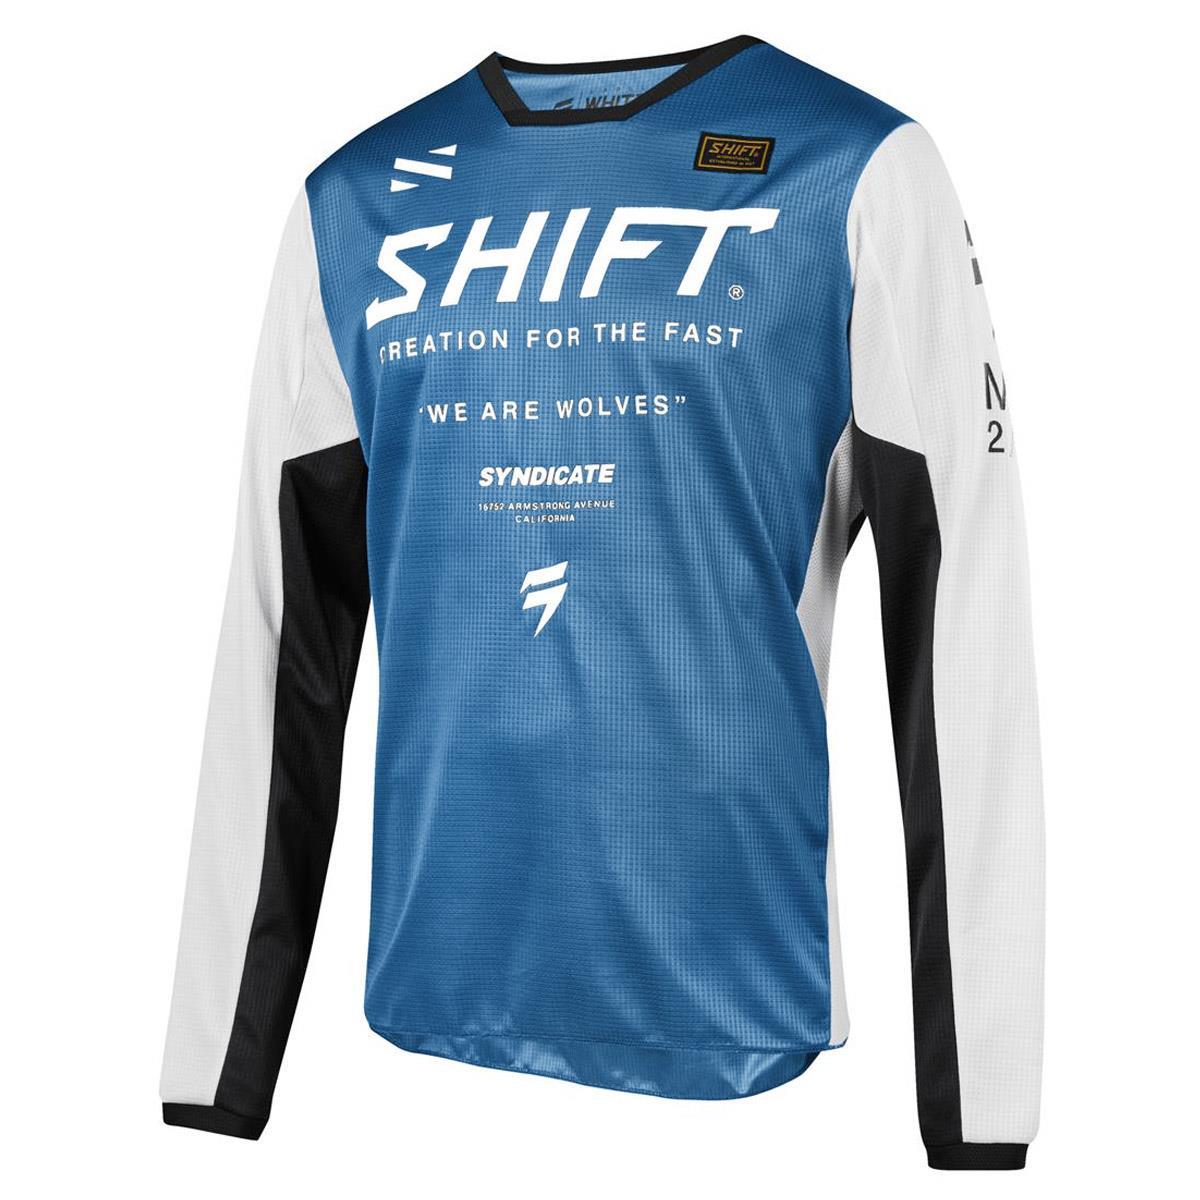 Shift Jersey Whit3 Label Muse Blau